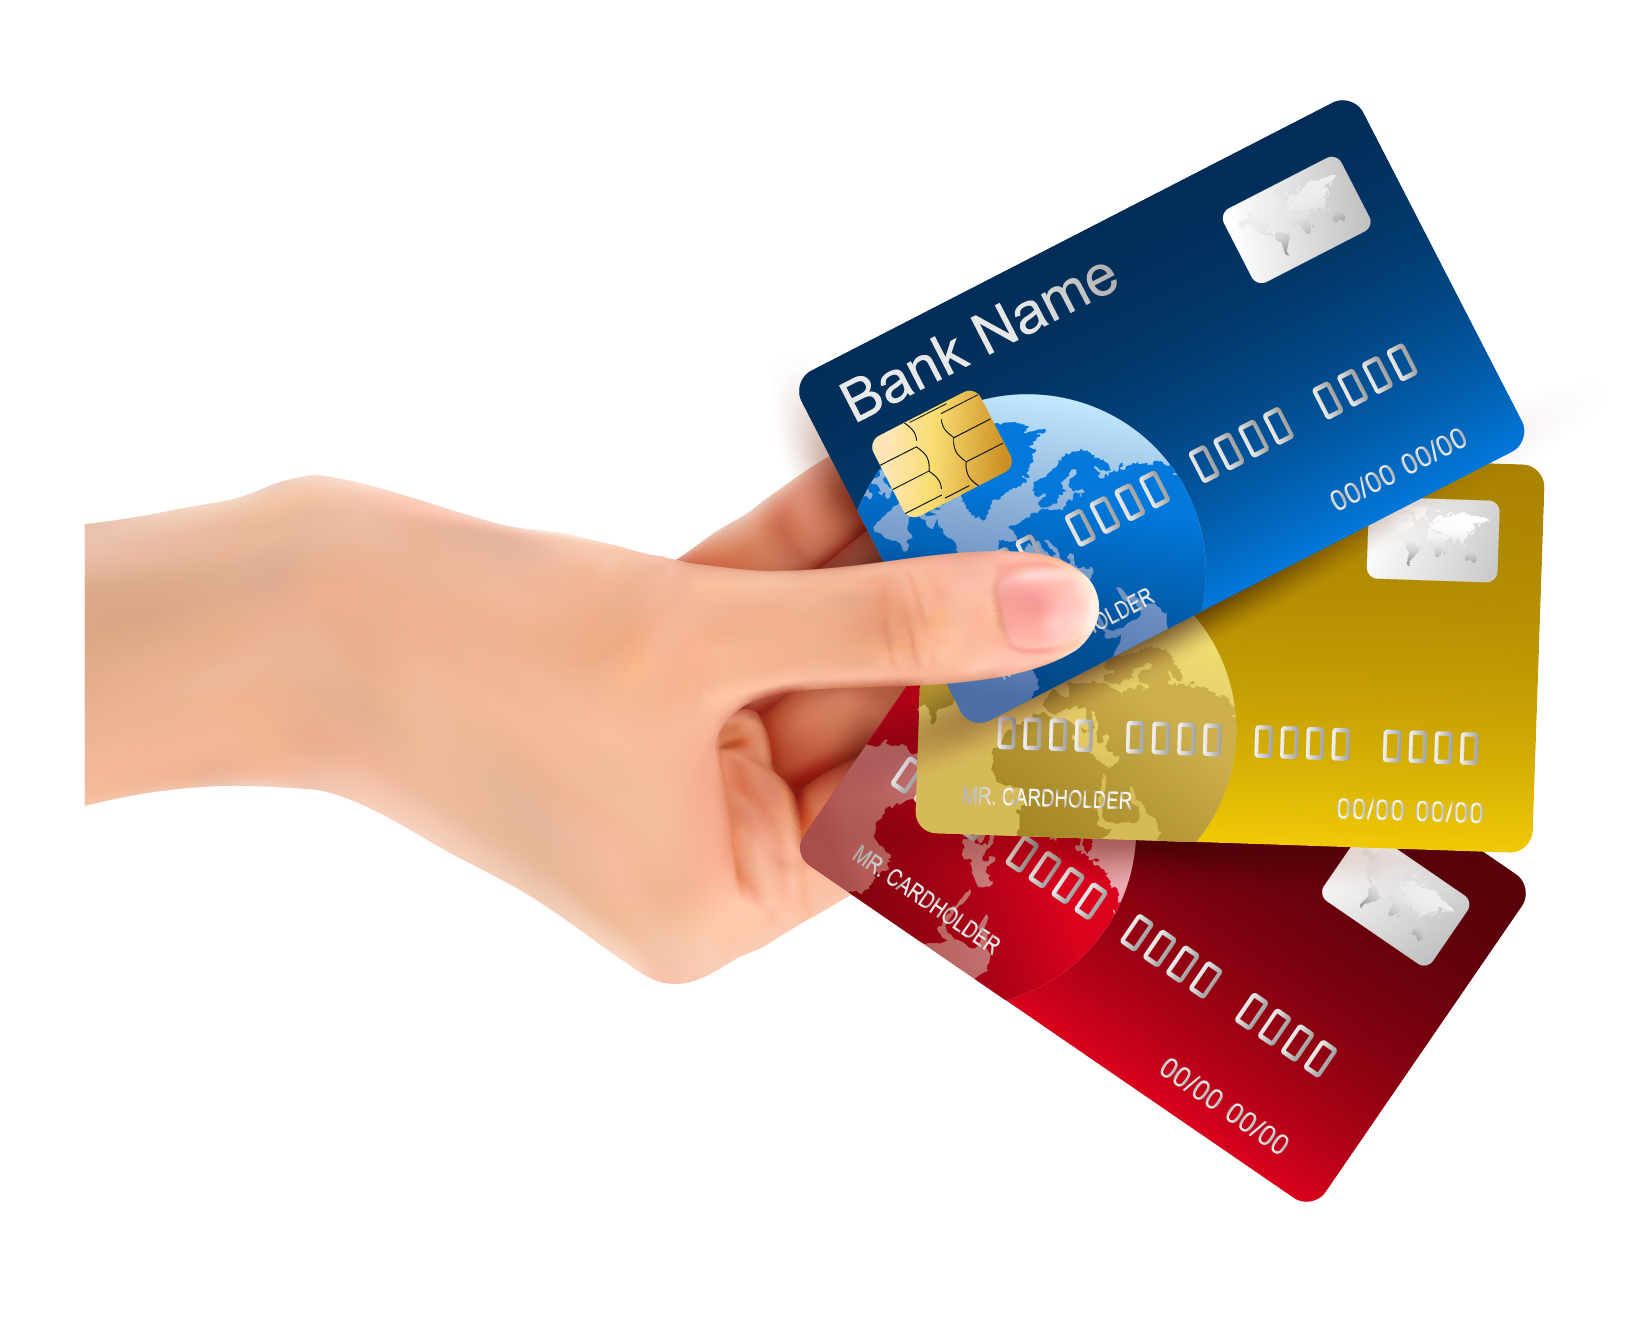 Сервис на сайте банка для оплаты услуг